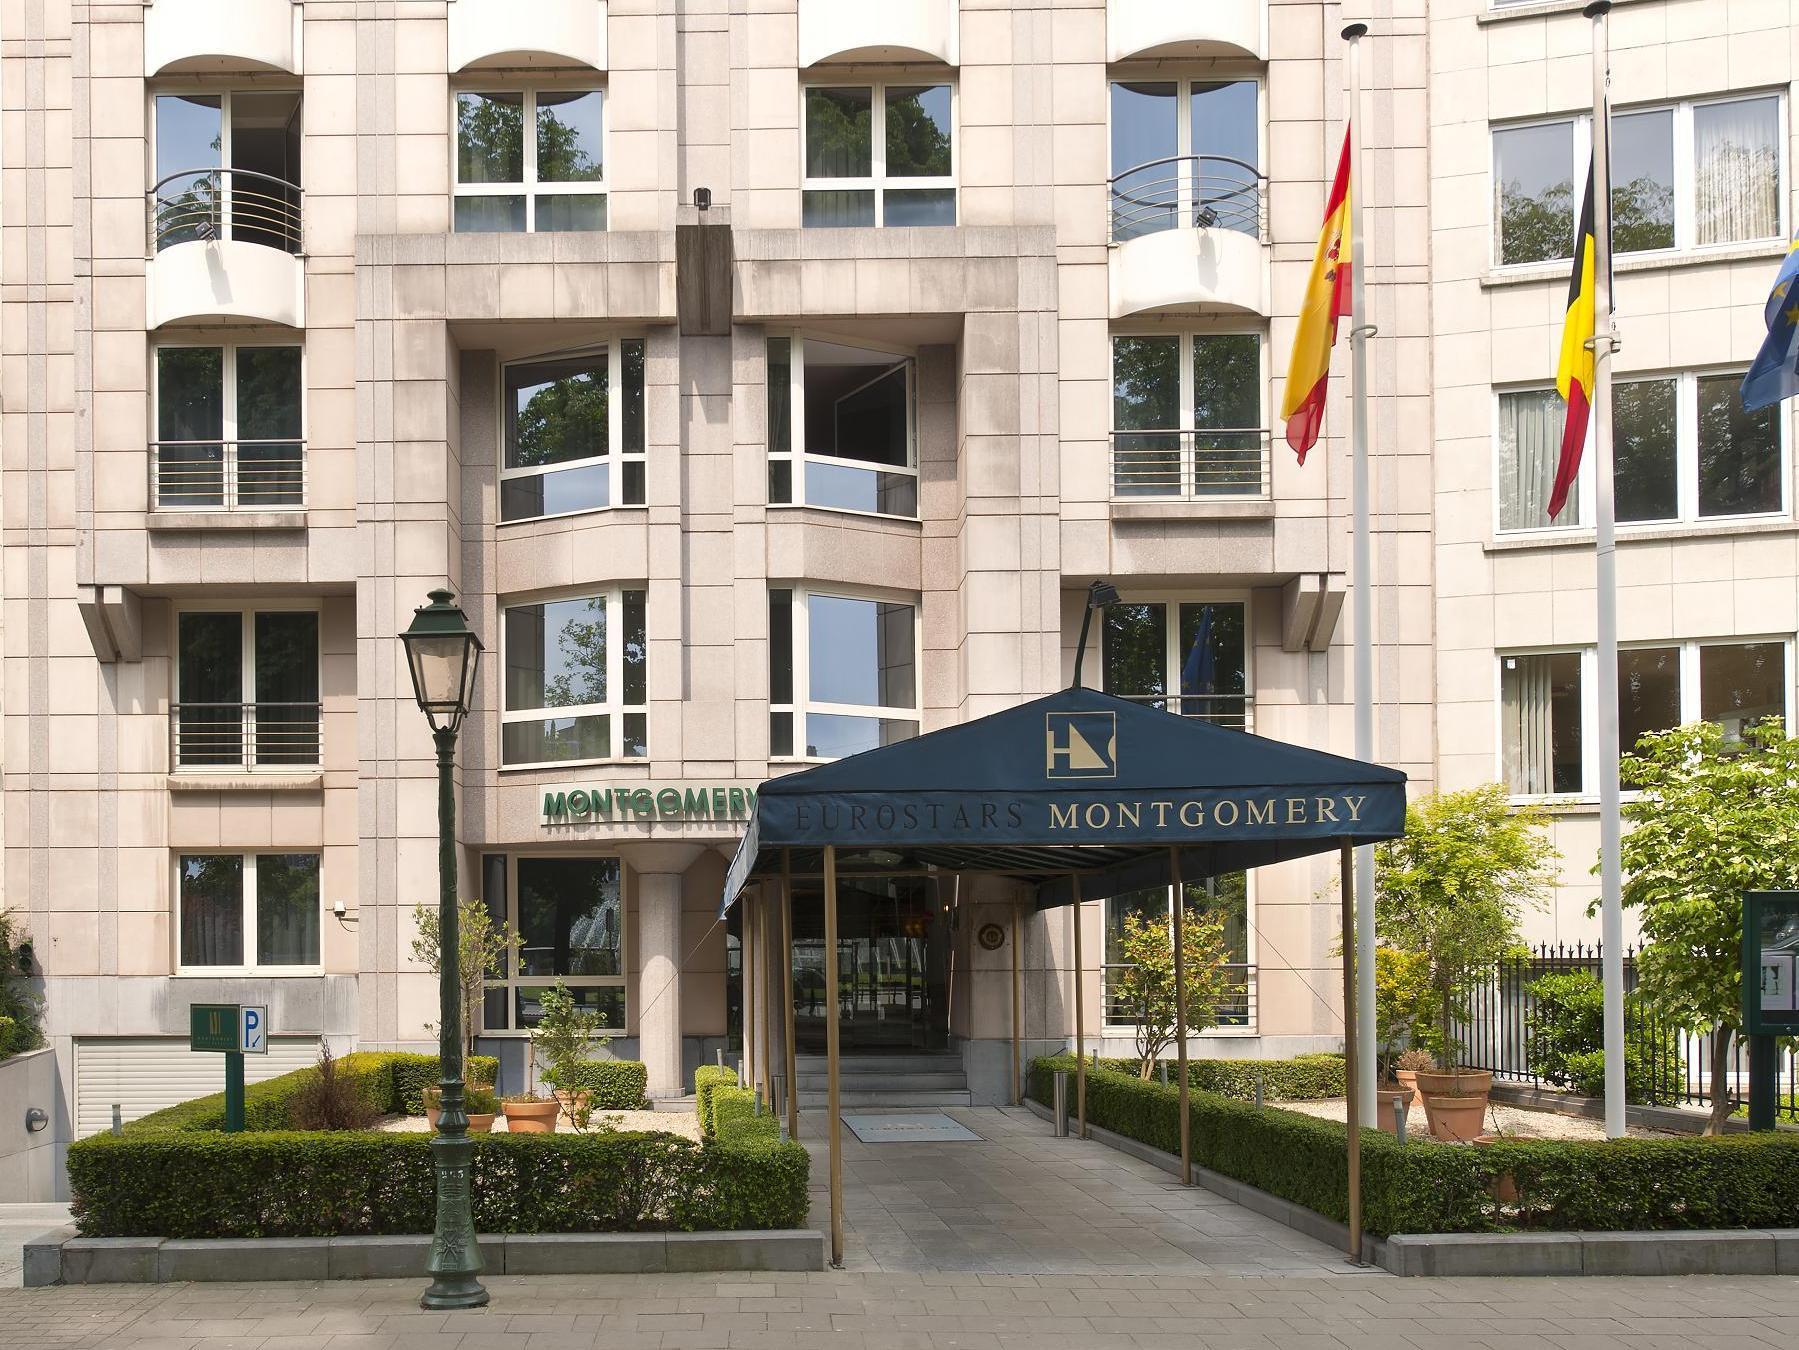 Eurostars Montgomery Hotel